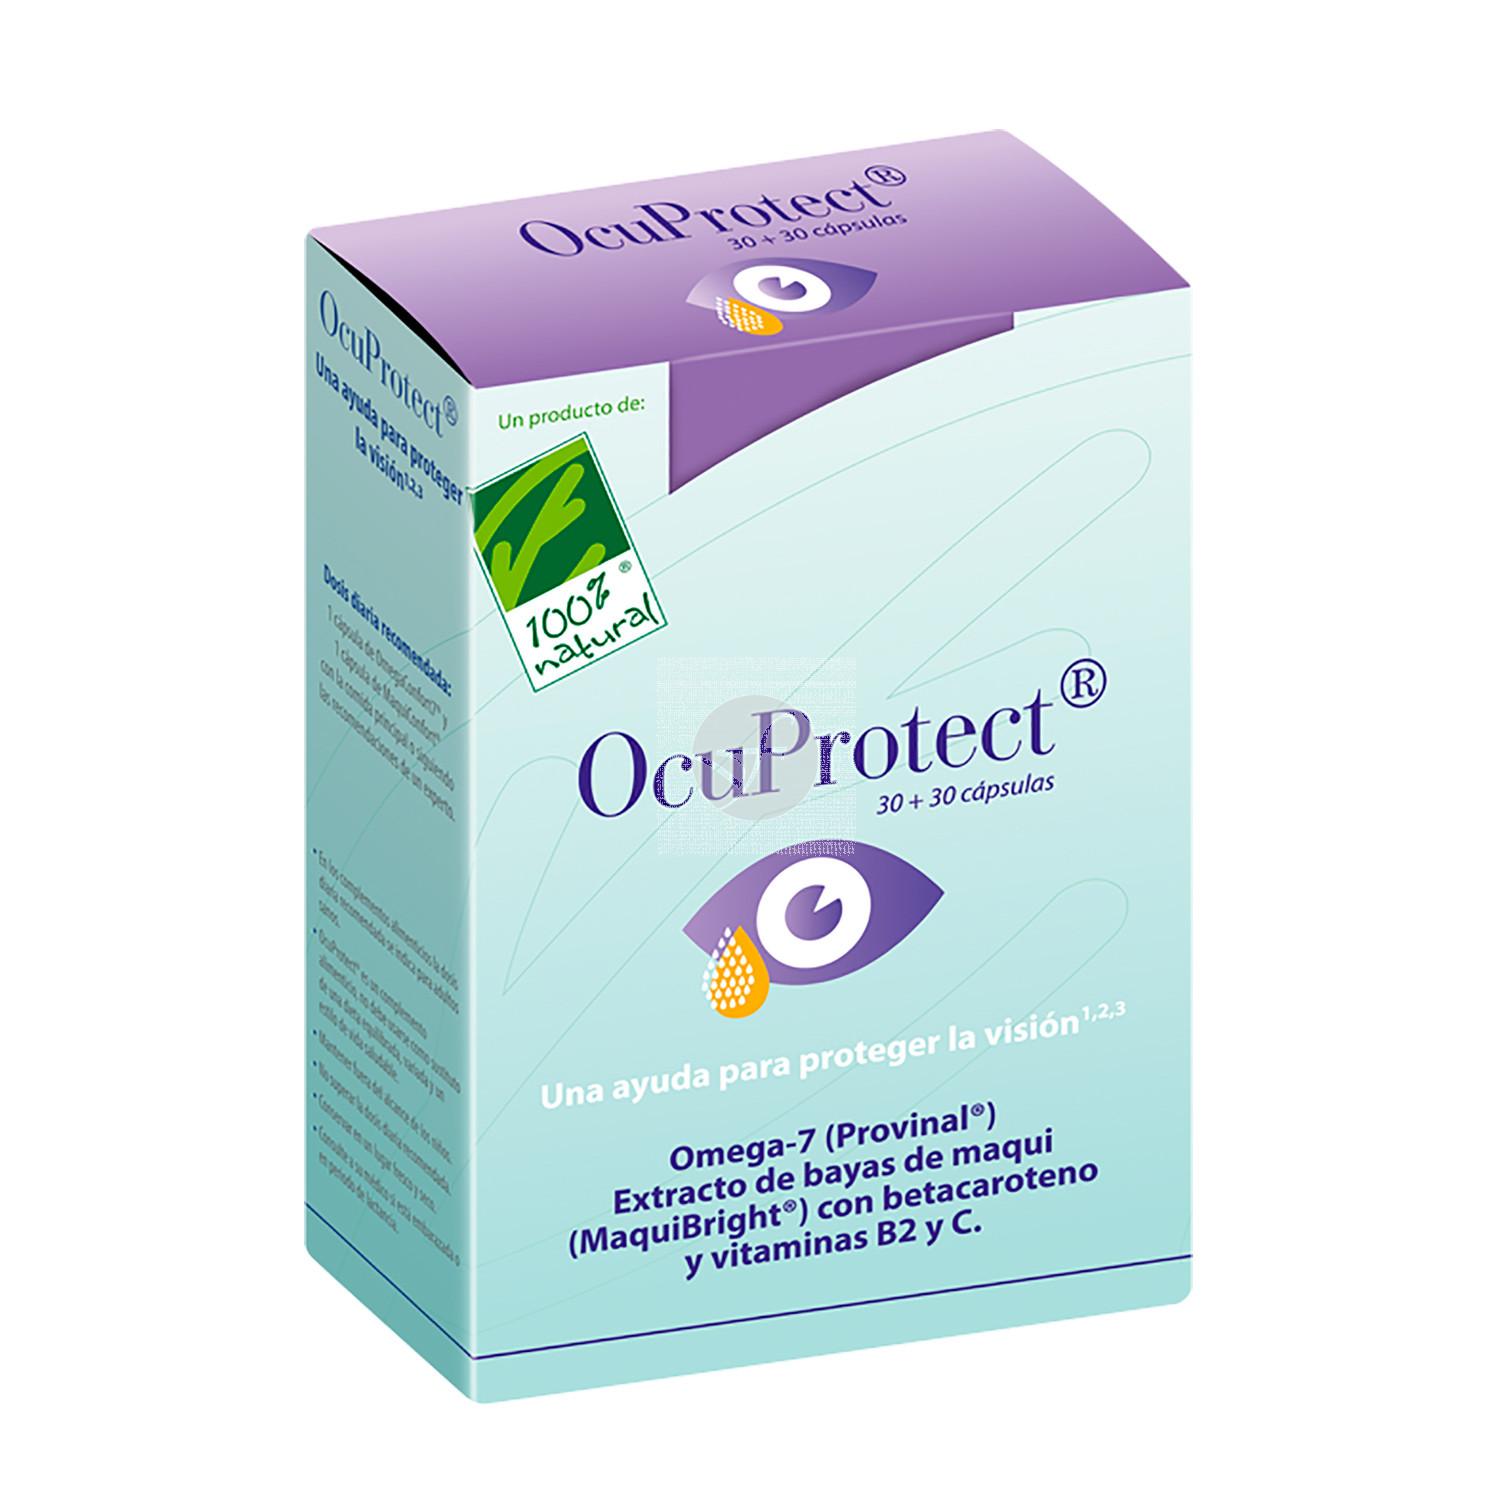 Ocuprotect 30 perlas + 30 capsulas 100% Natural